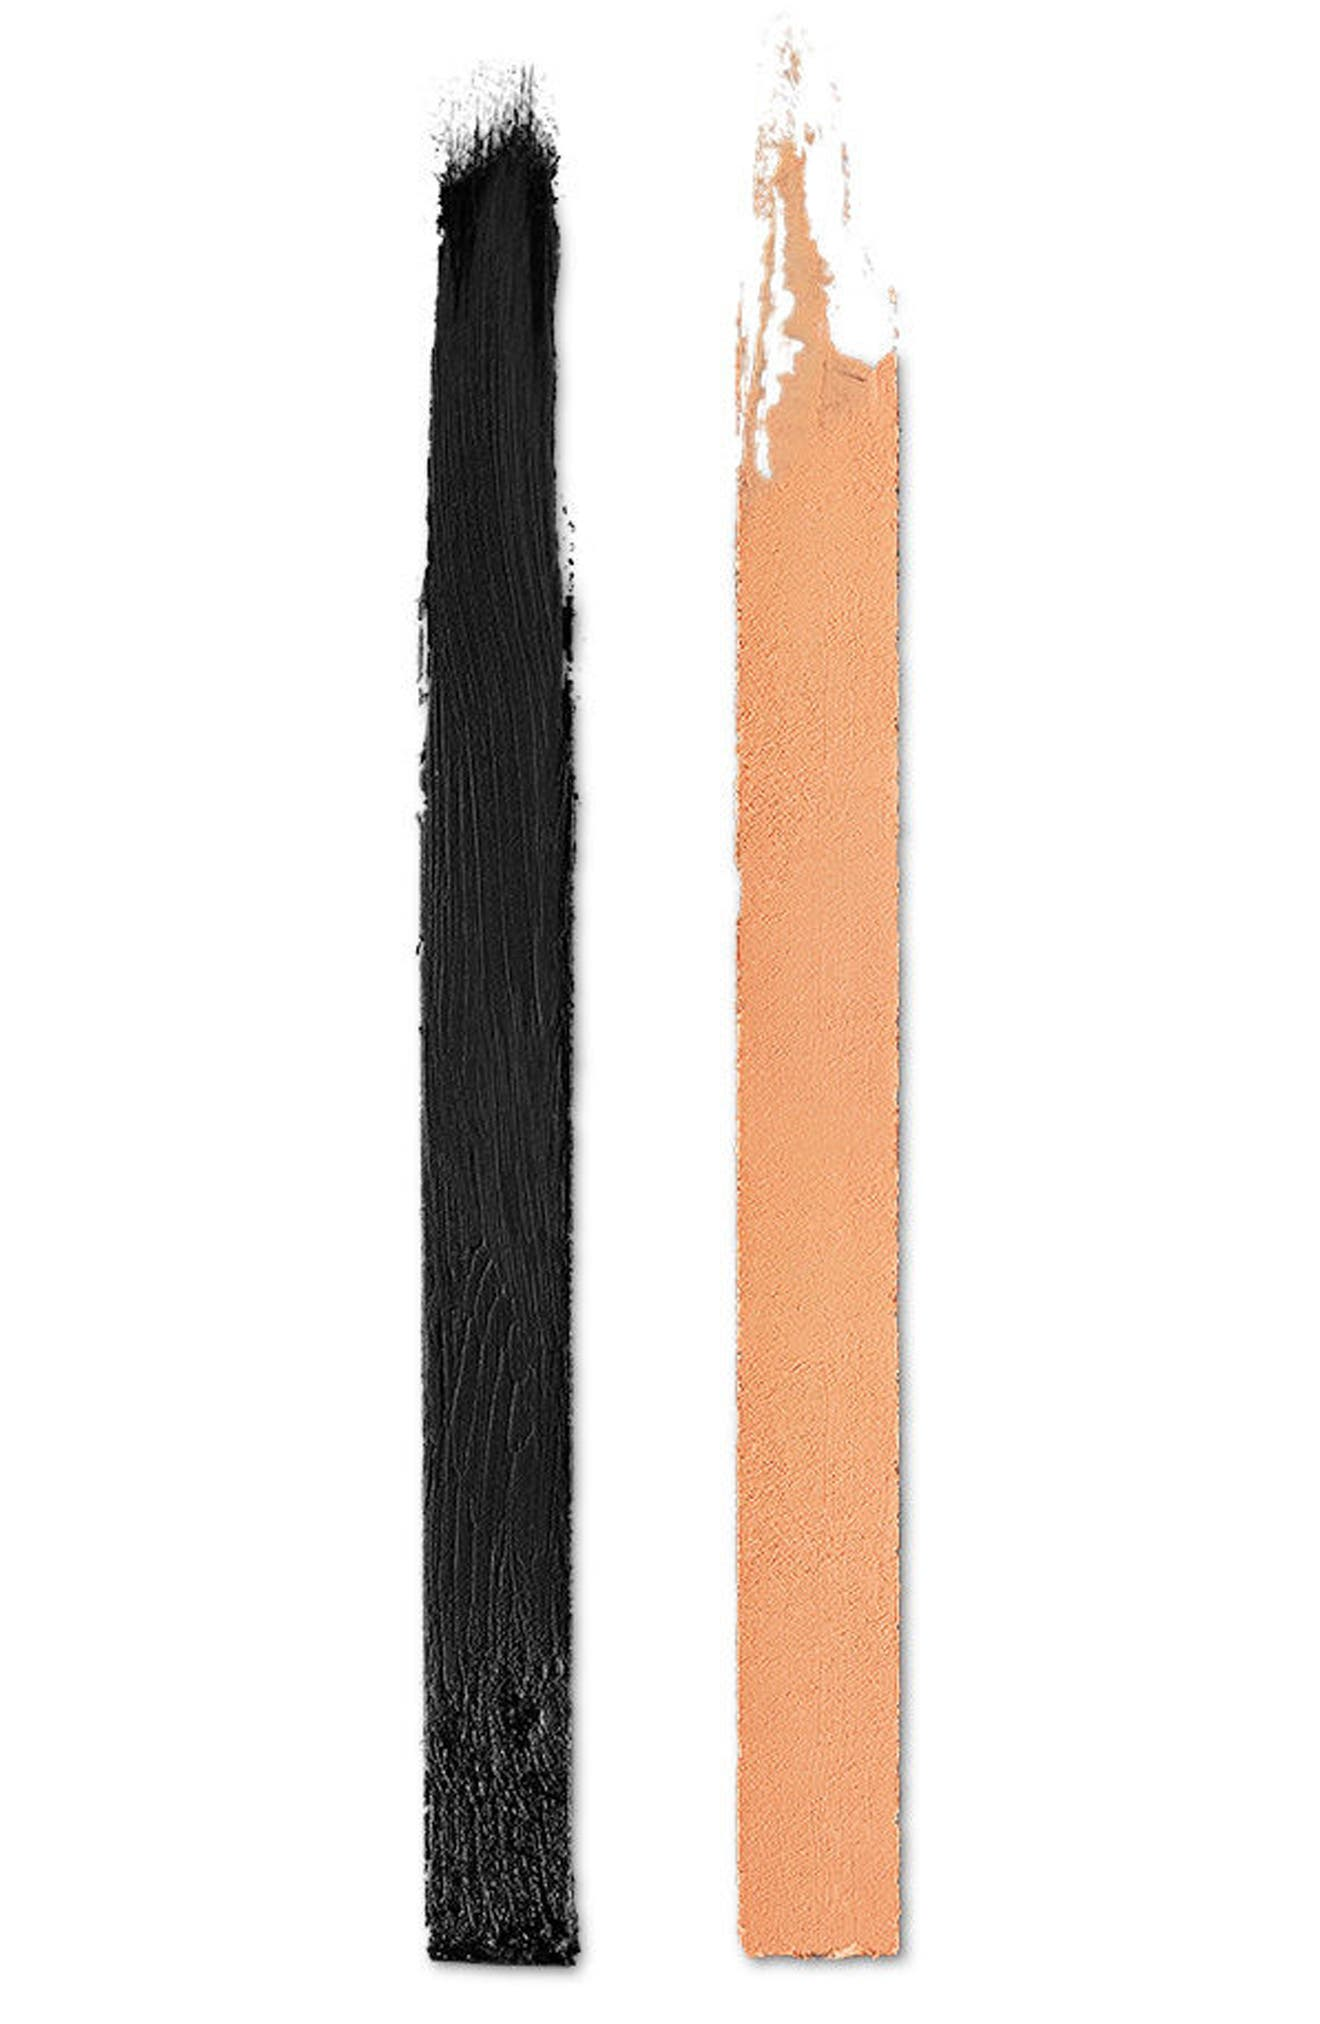 Victoria Beckham Eye Kajal,                             Alternate thumbnail 14, color,                             Black Saffron/ Vanille